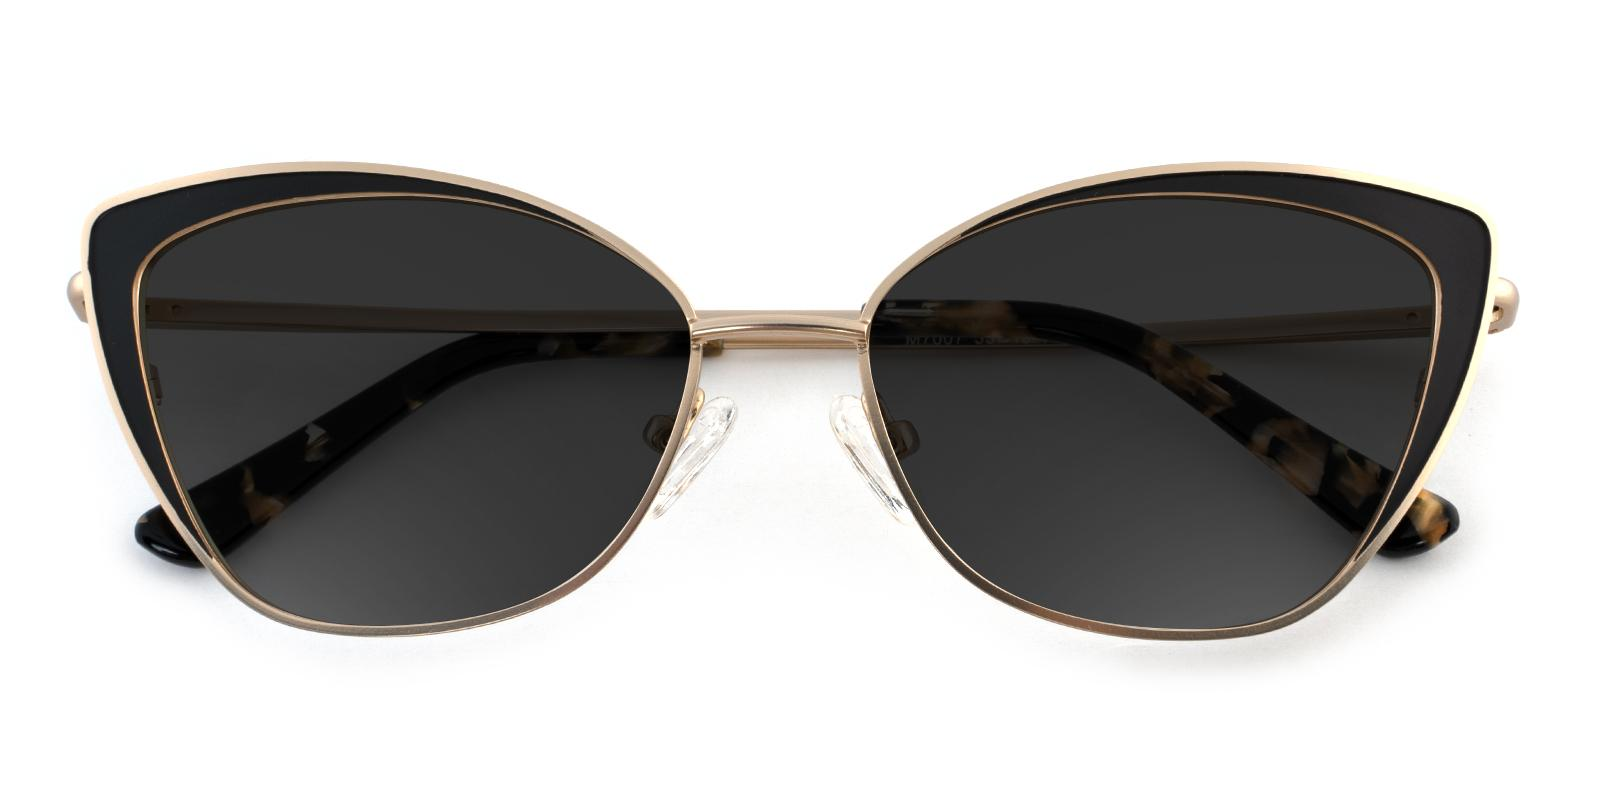 Primrose Gold Metal NosePads , SpringHinges , Sunglasses Frames from ABBE Glasses